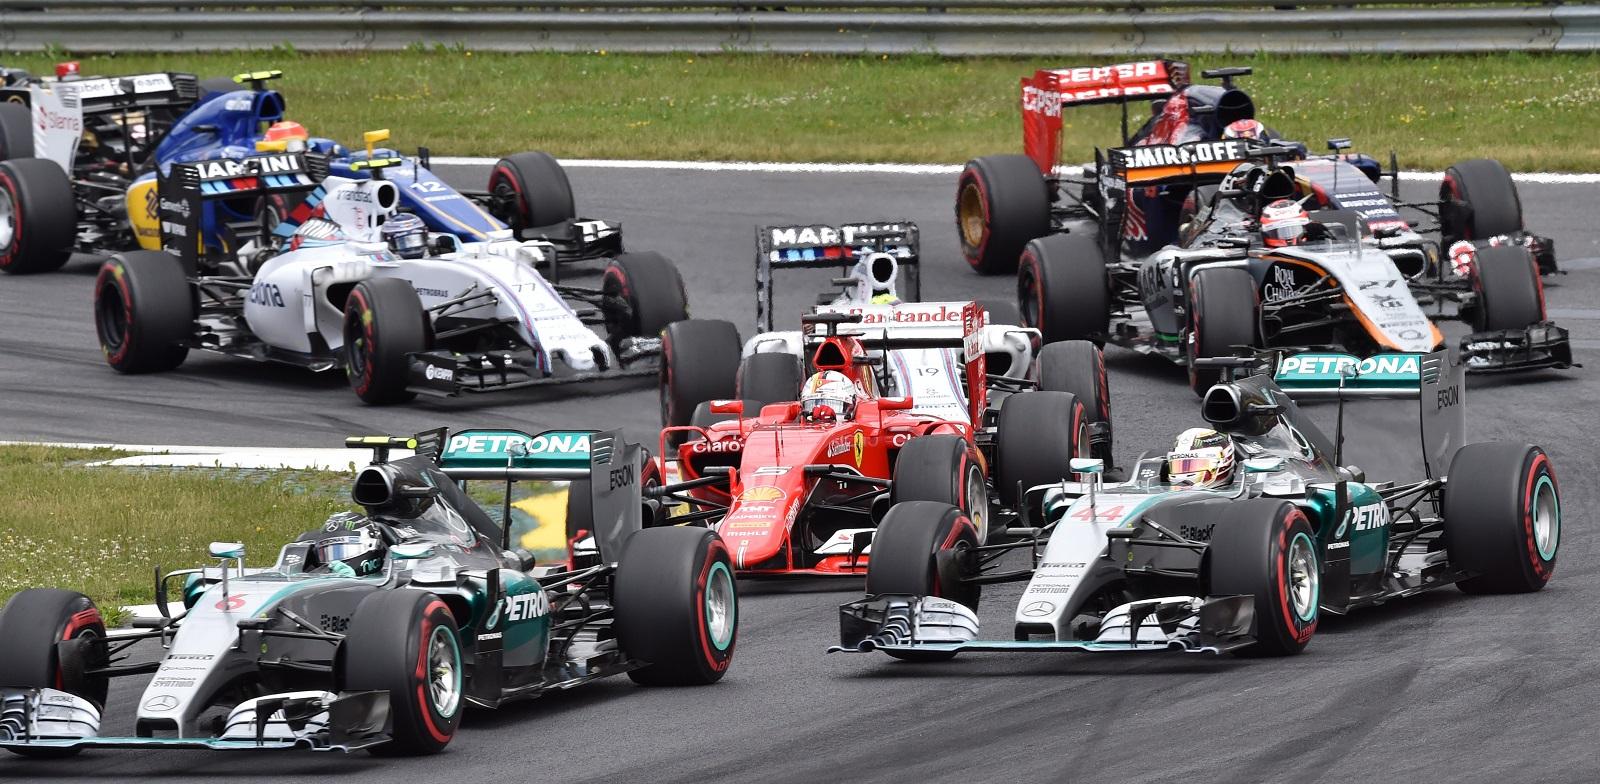 Start of the Austrian F1 Grand Prix